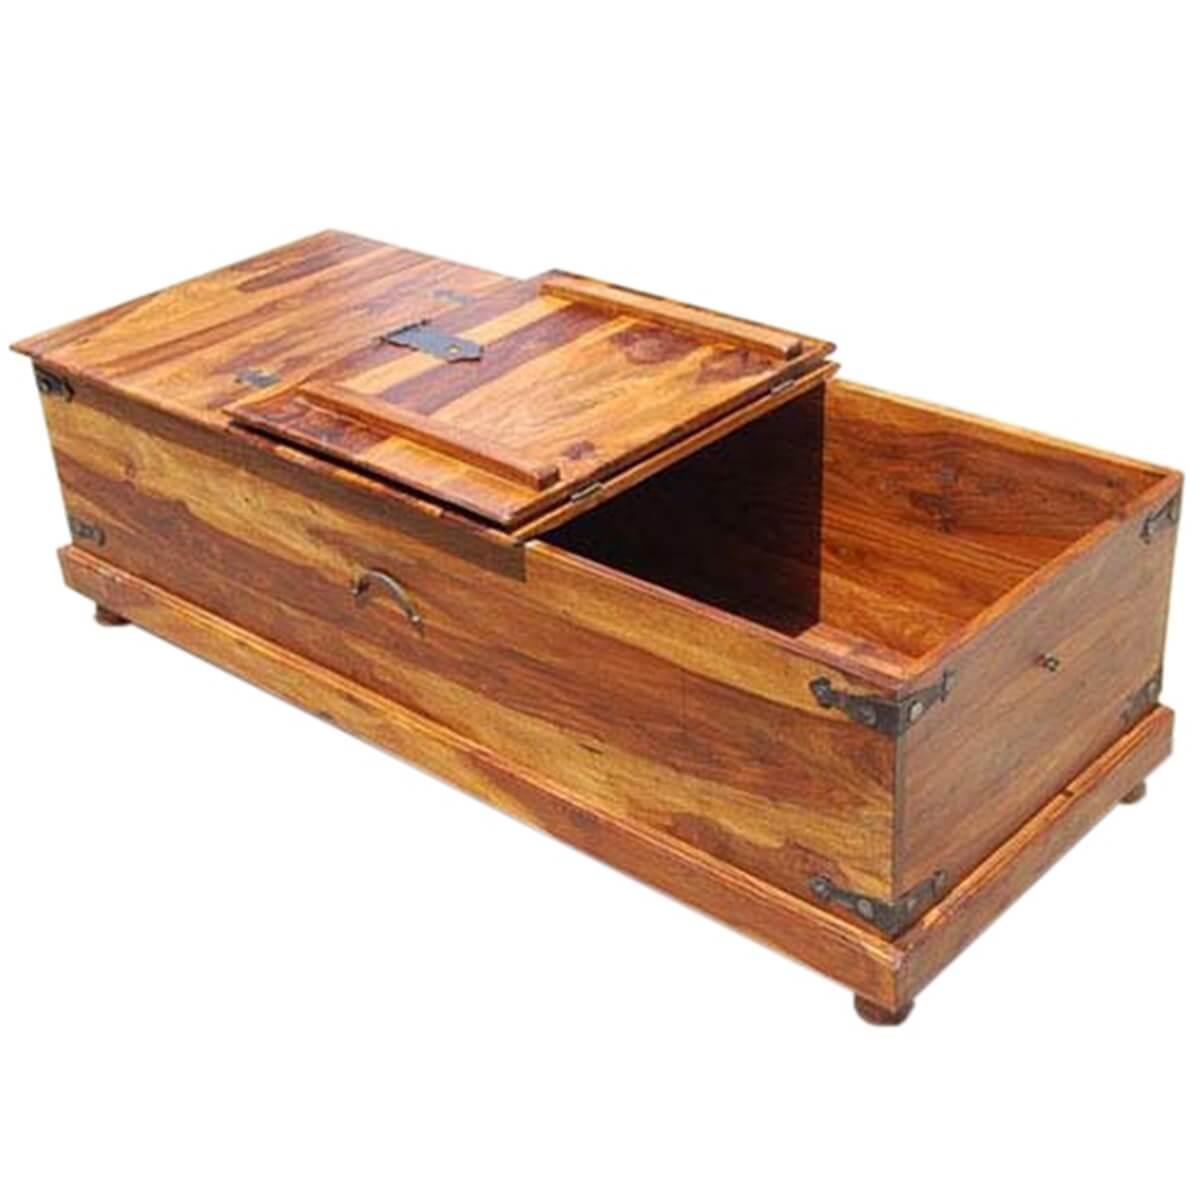 Solid Wood Bedroom Kokanee Rustic Storage Coffee Table